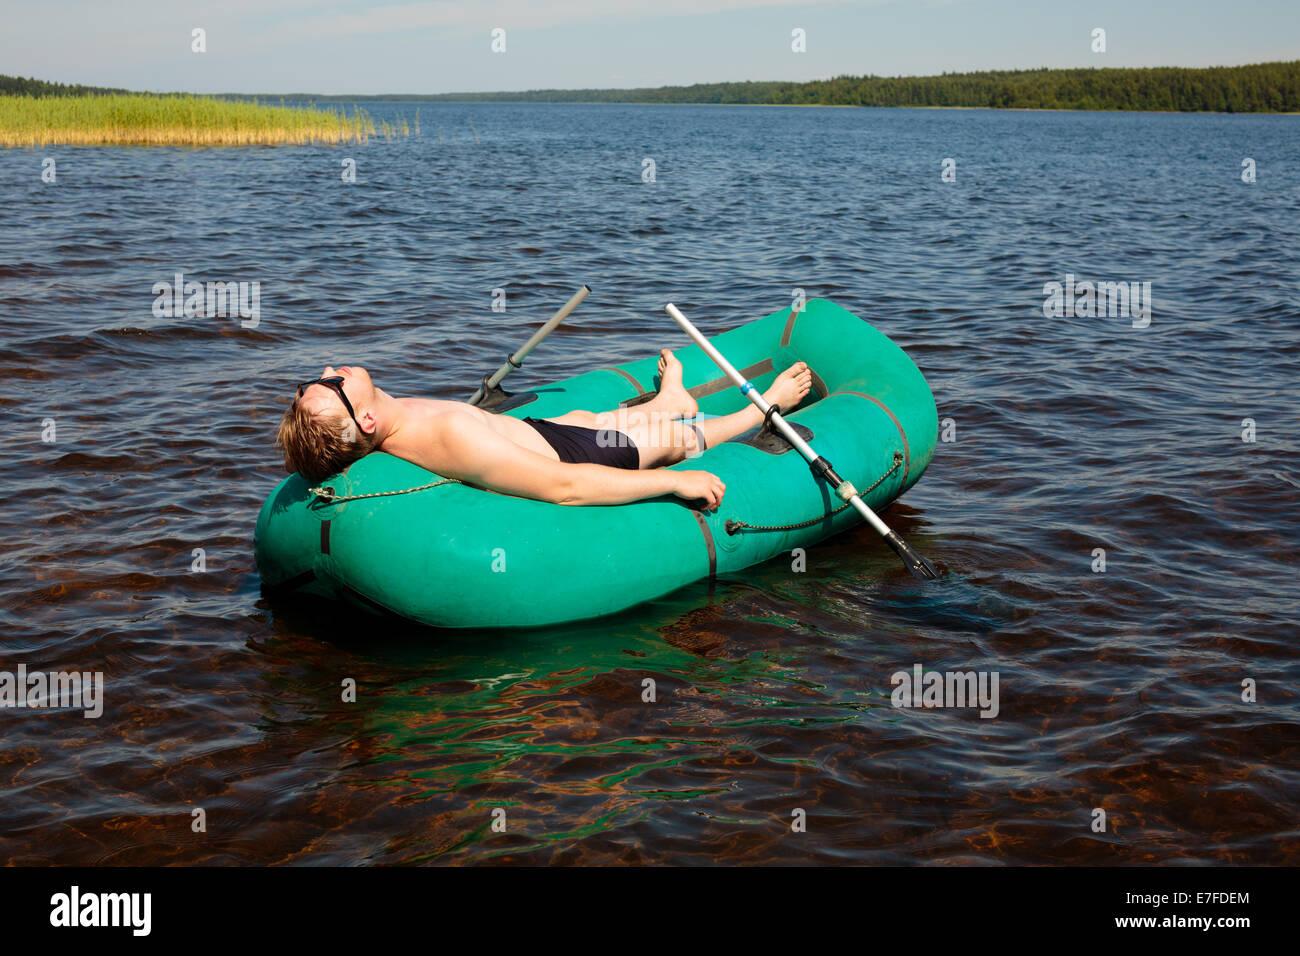 Hombre descansando en un bote de goma Imagen De Stock